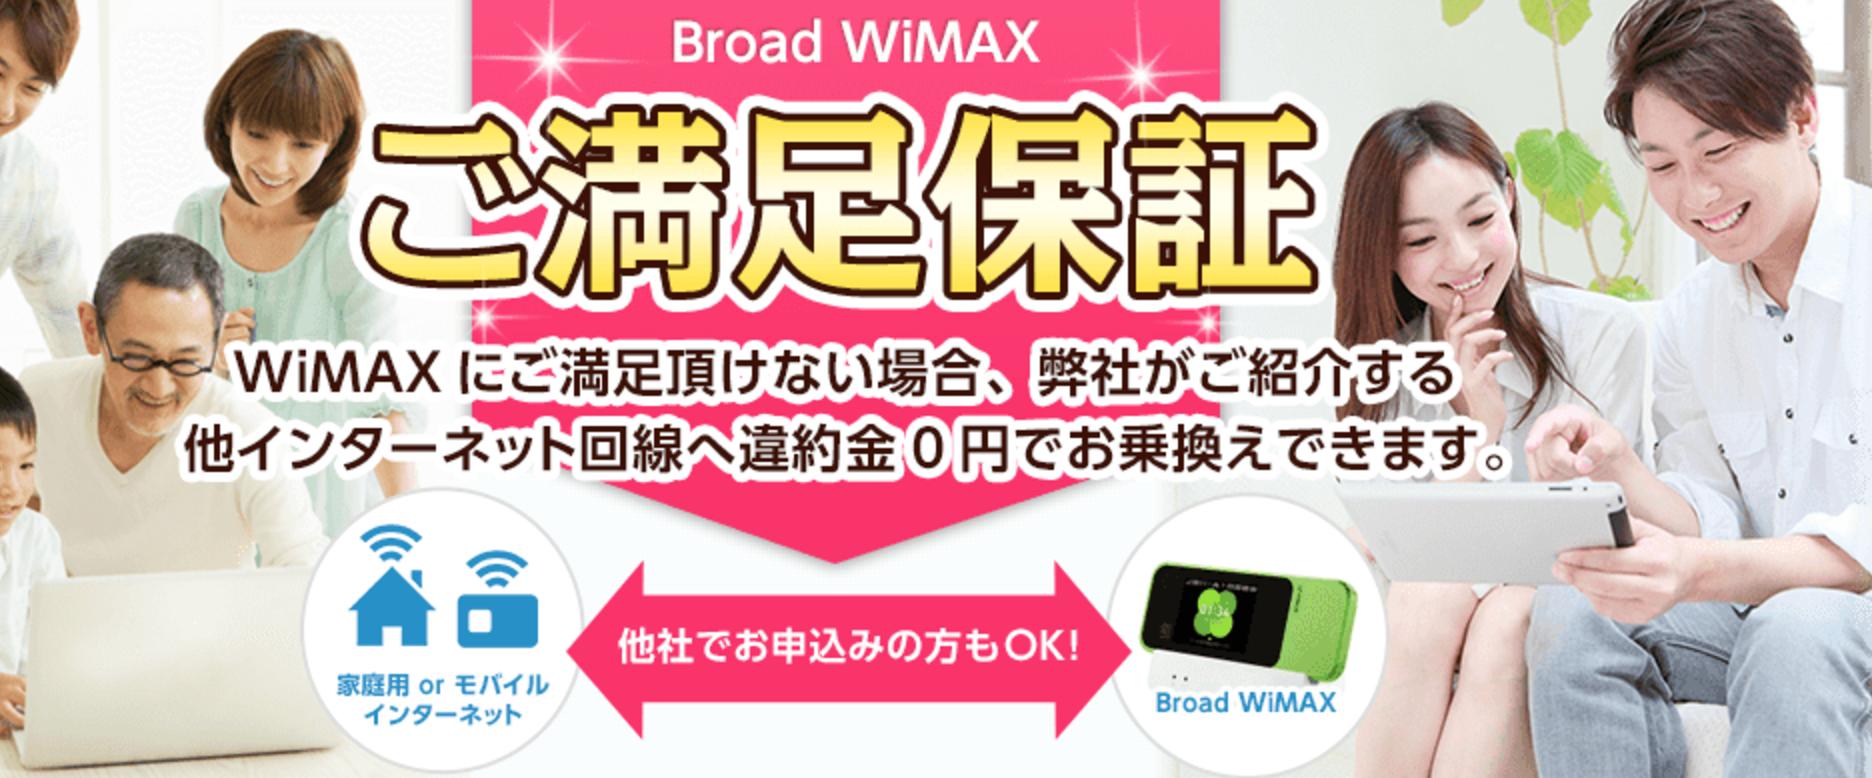 Broad WiMAX違約金なし_乗り換え